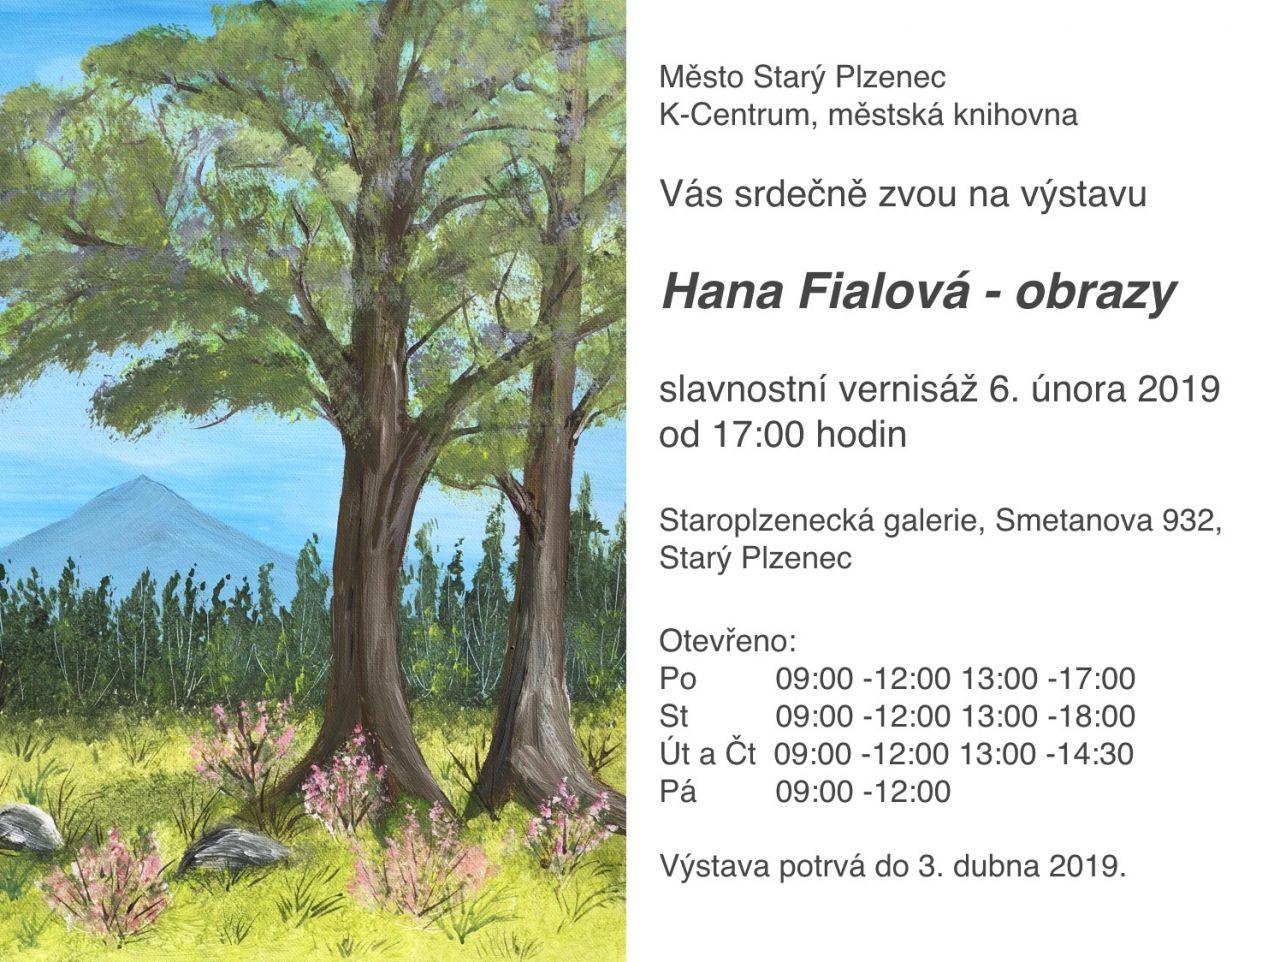 Hana Fialová obrazy